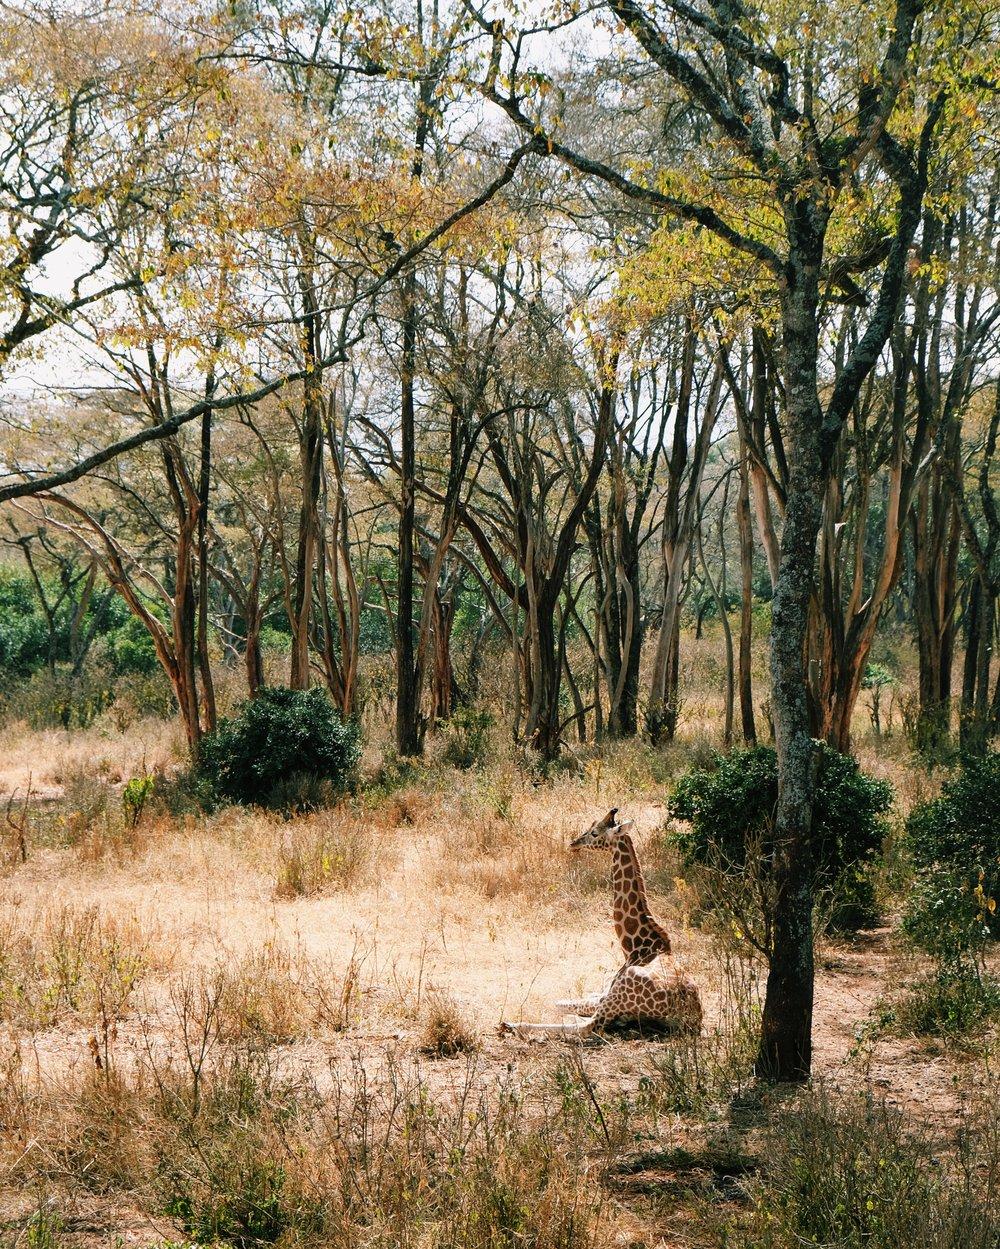 Giraffe Center in Nairobi National Park 2 by Joost Bastmeijer.jpeg